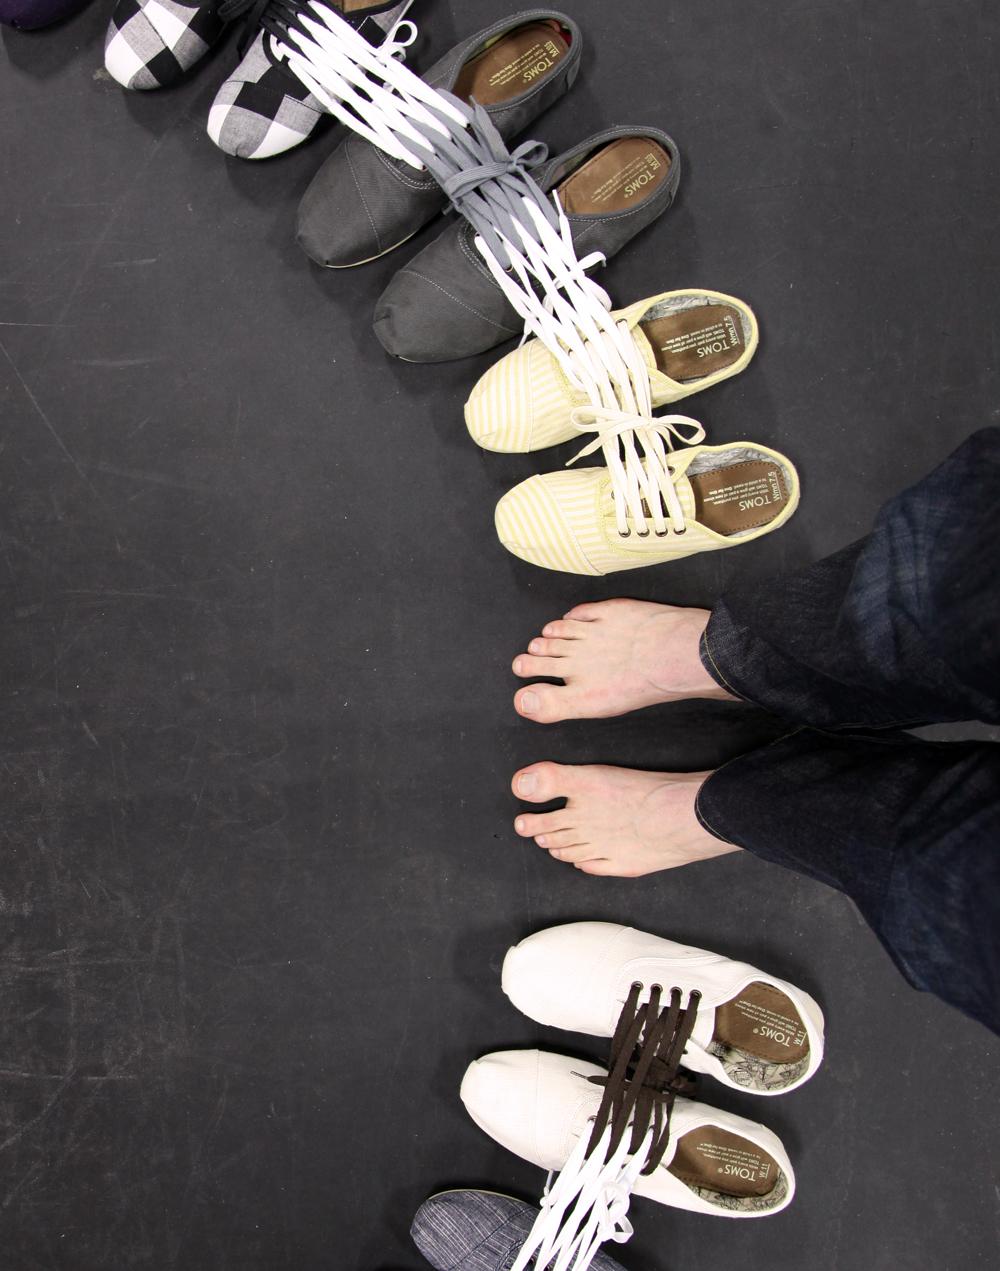 Circuit, 2011 (feet)